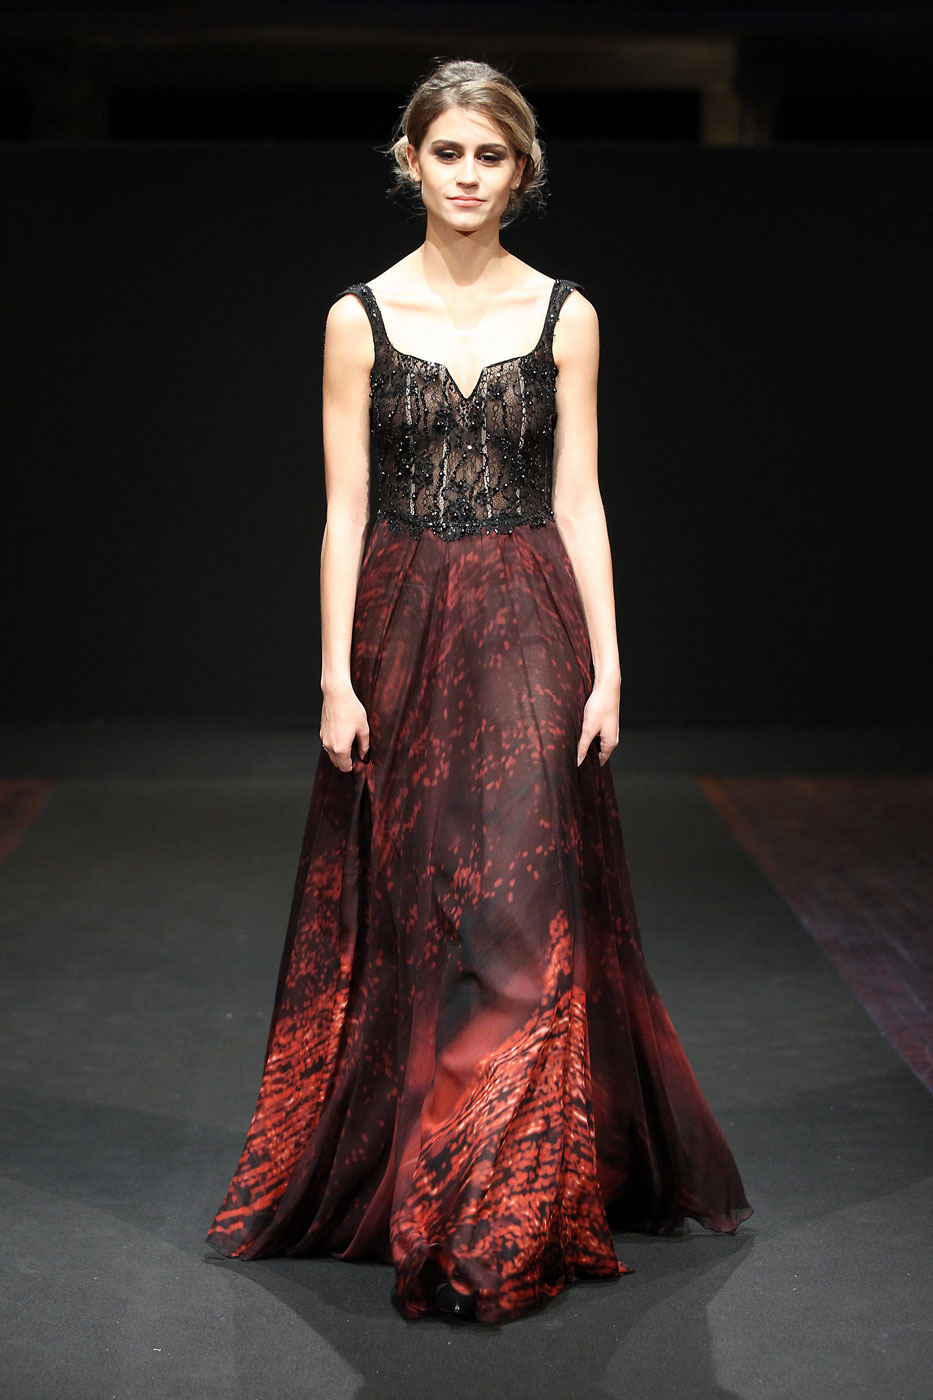 Abed-Mahfouz-fashion-runway-show-haute-couture-paris-spring-2015-the-impression-33